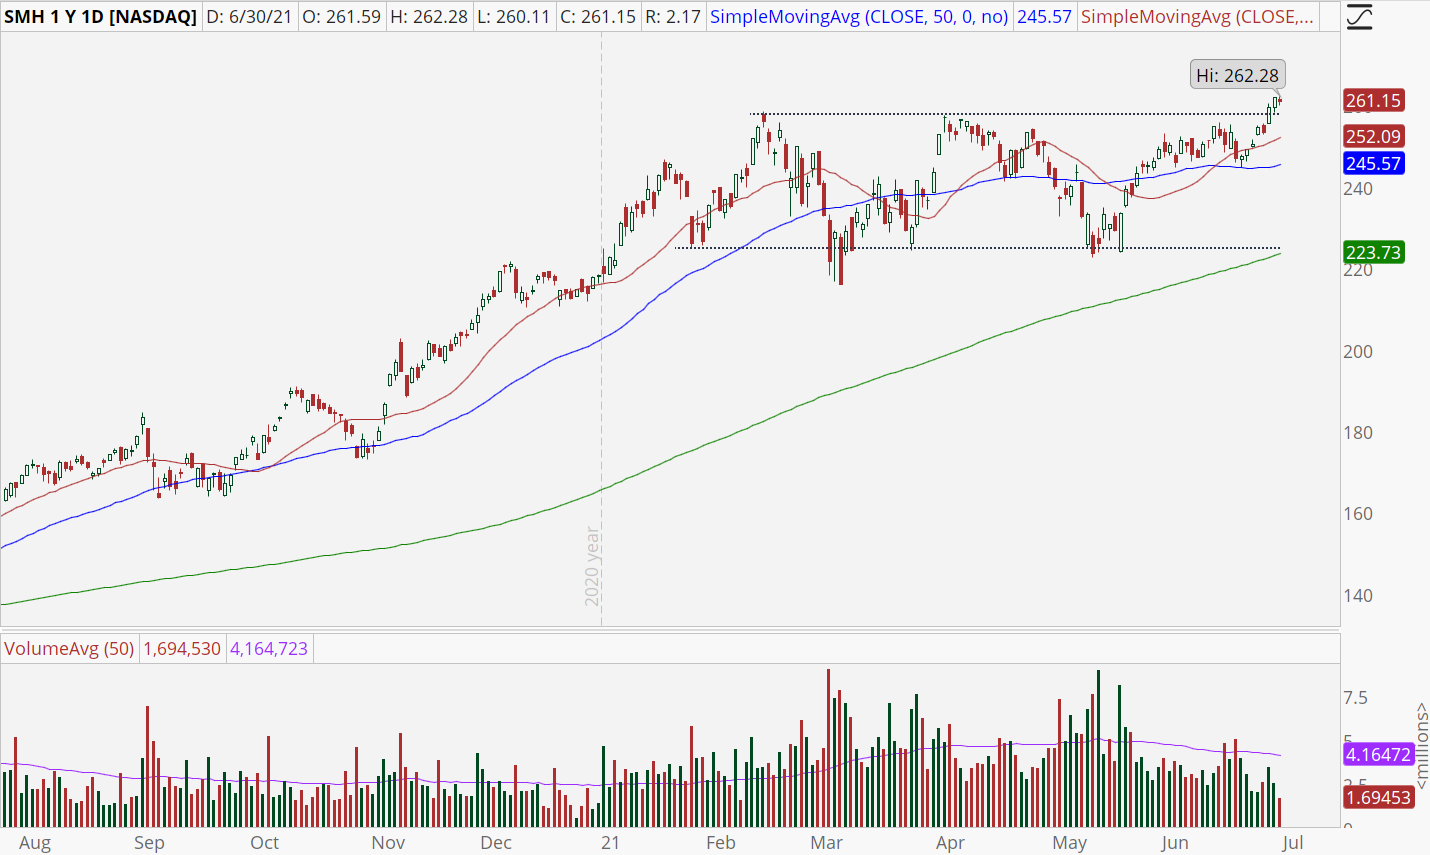 Market Vectors Semiconductor ETF (SMH) with bullish breakout